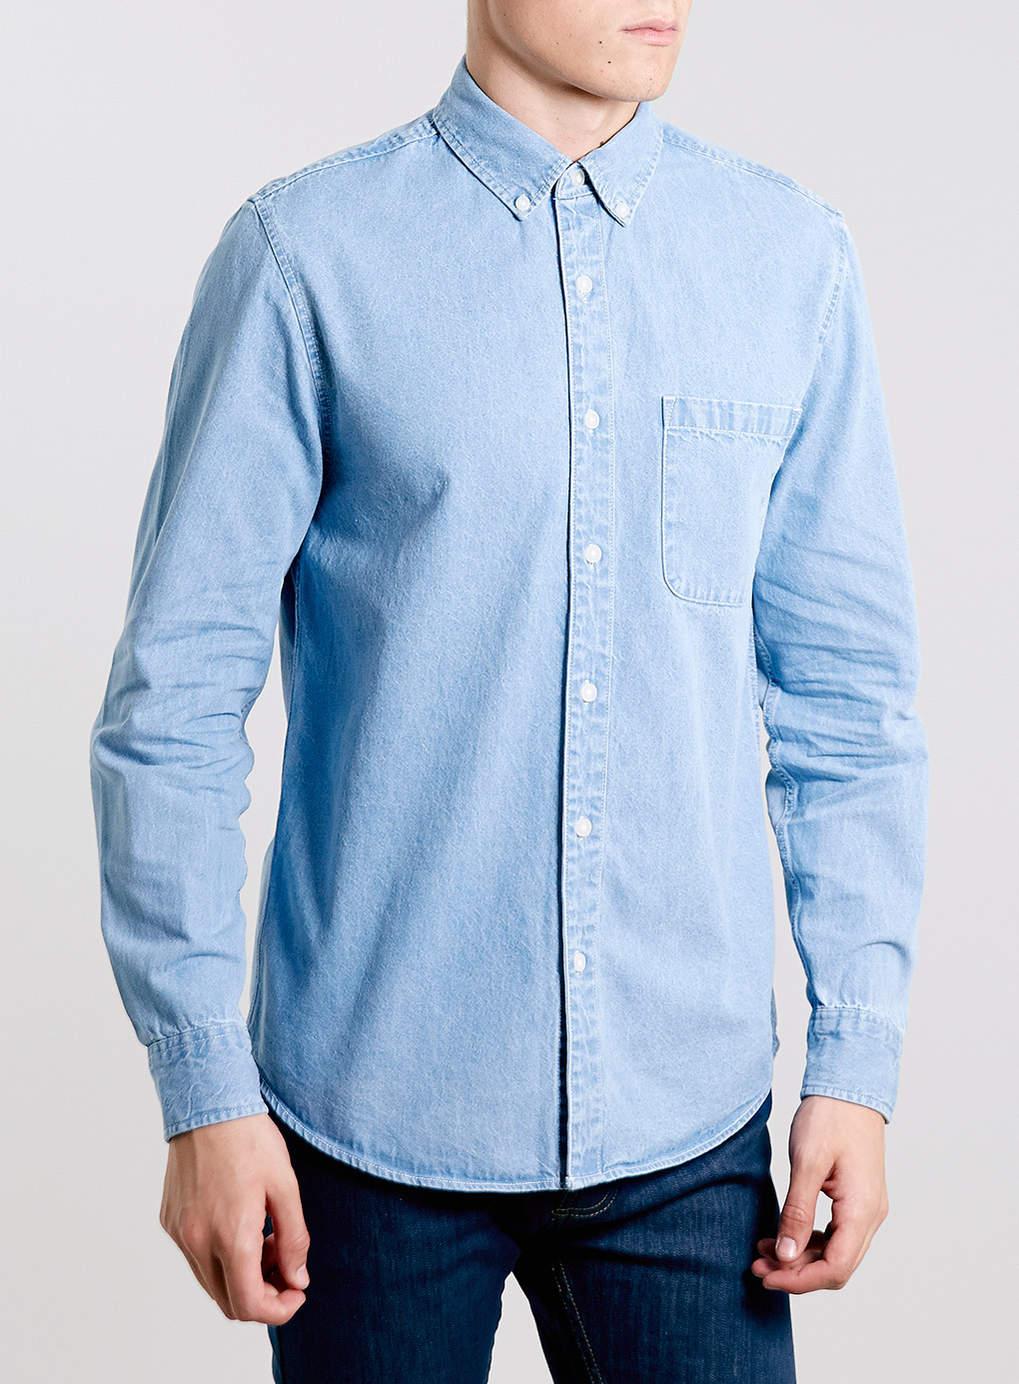 Topman Blue Bleach Denim Button Down Collar Shirt In Blue